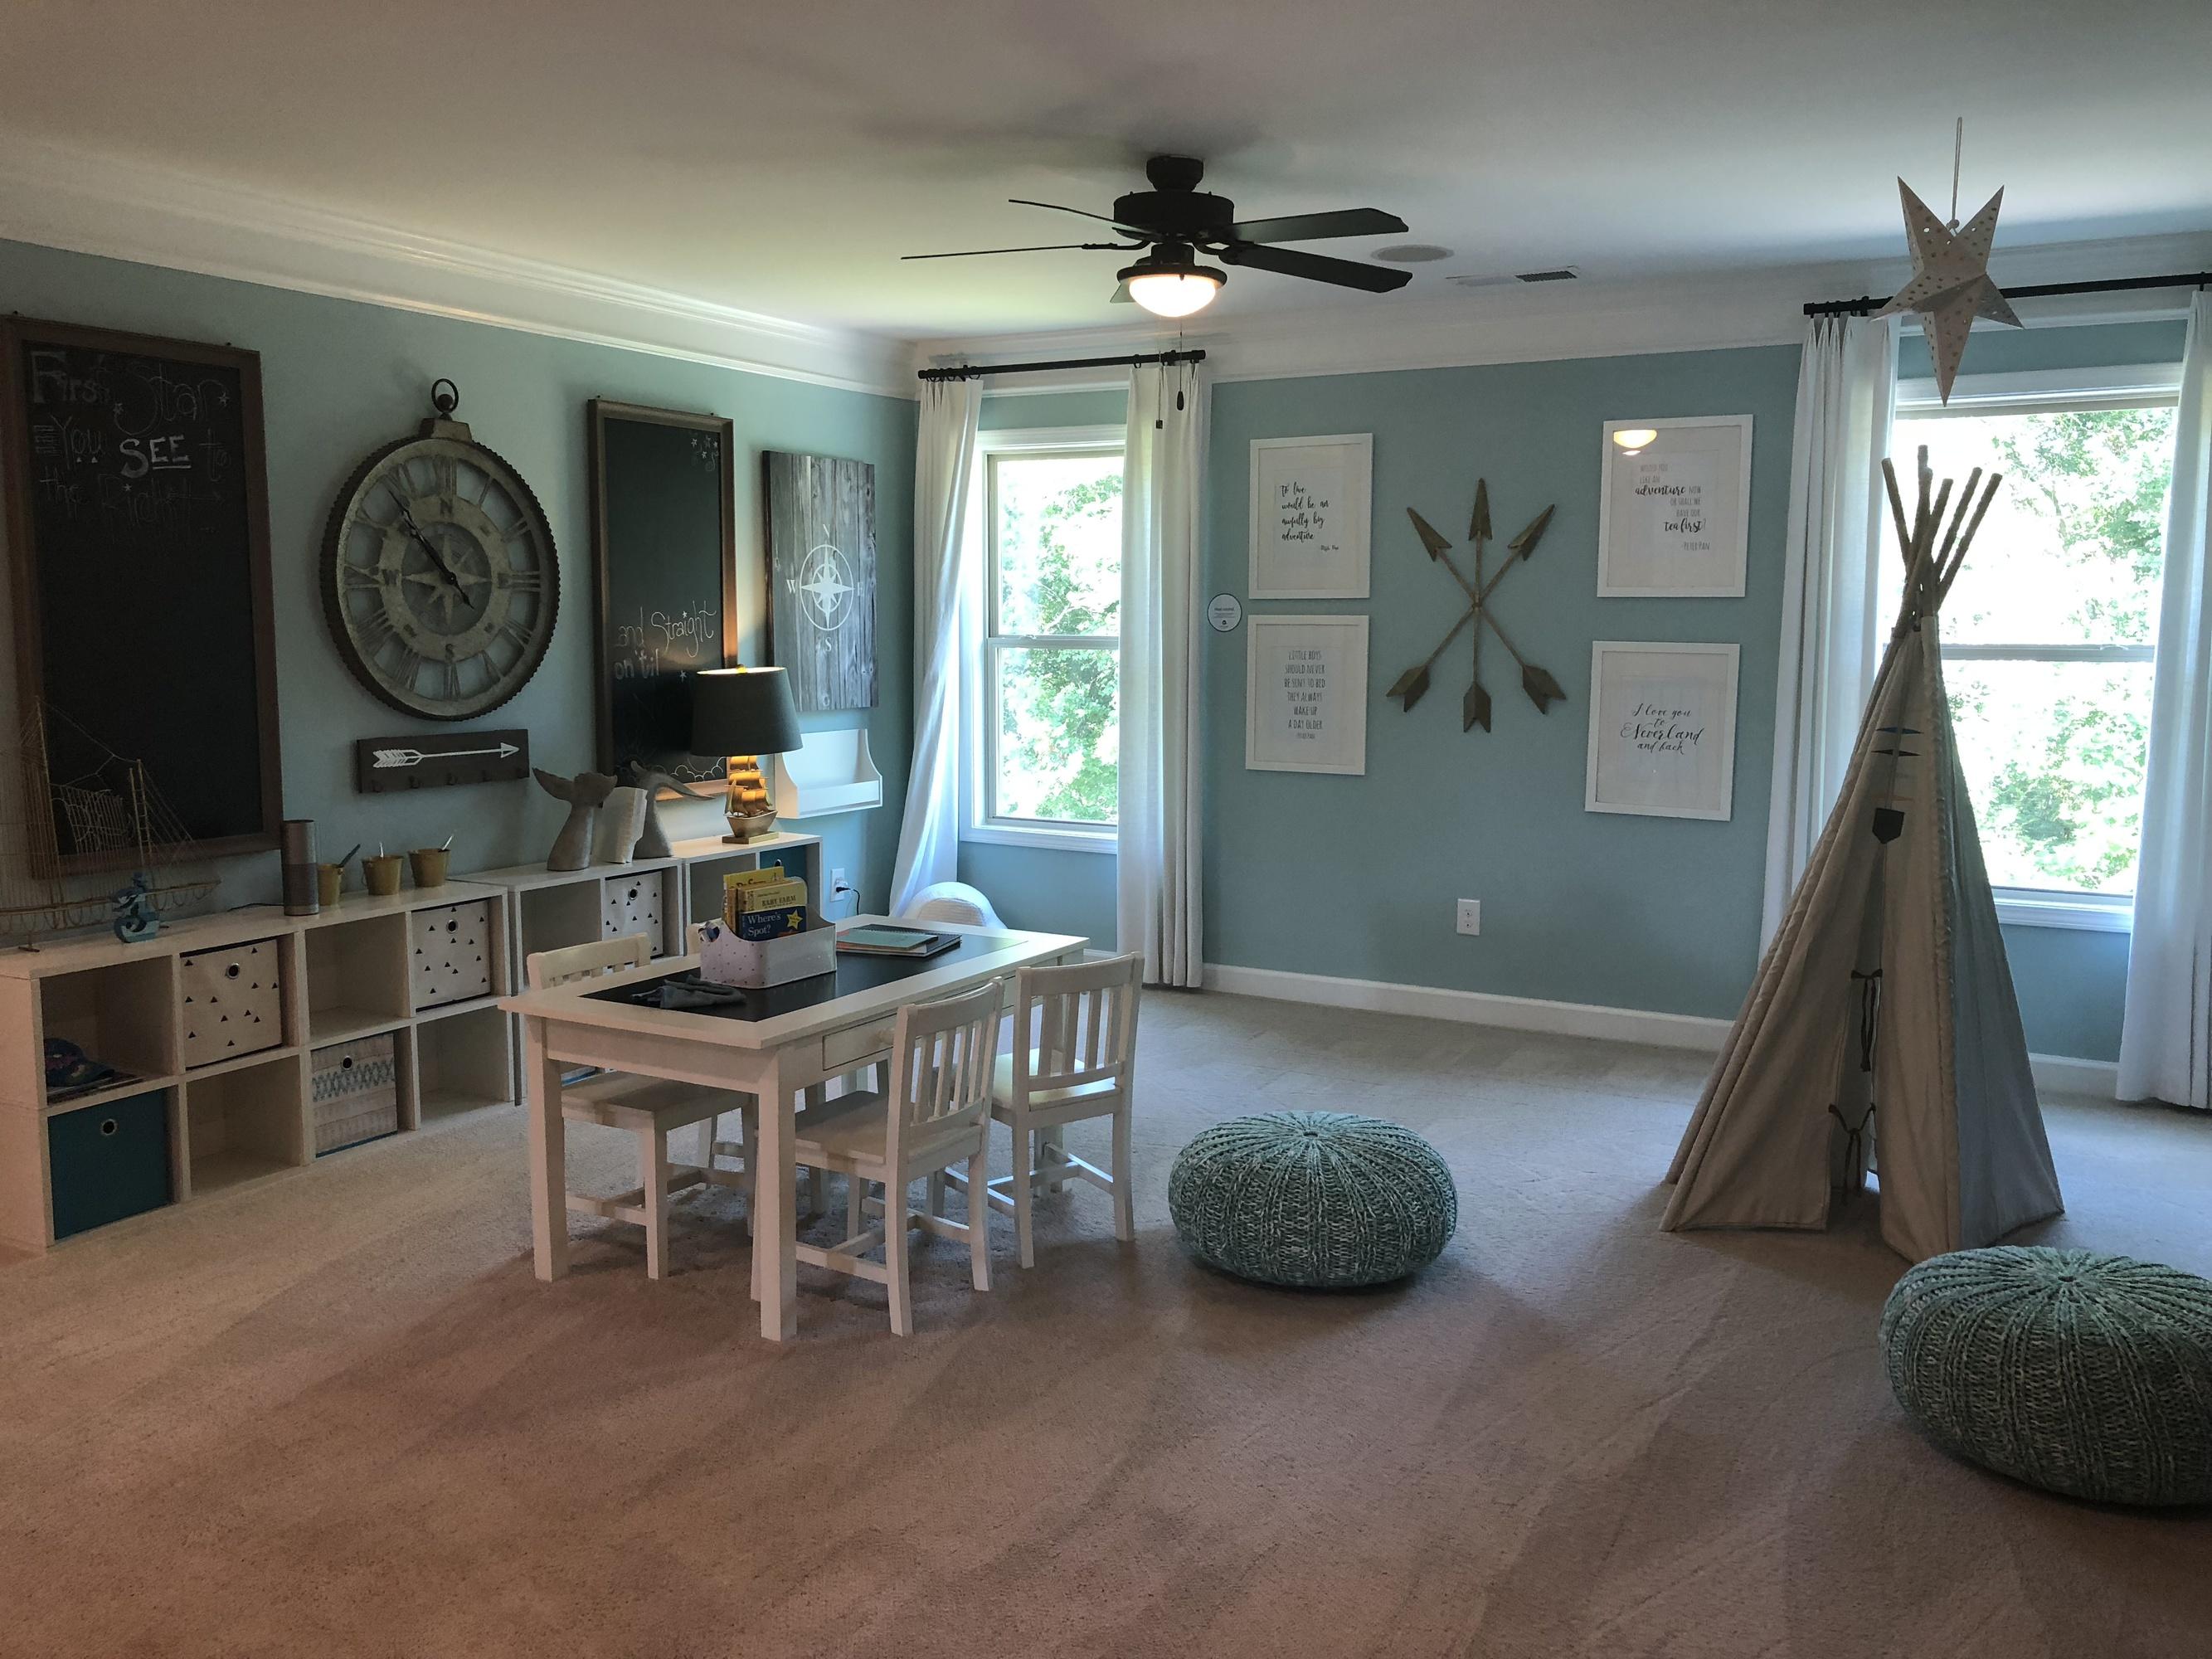 Lennar Amazon children's playroom